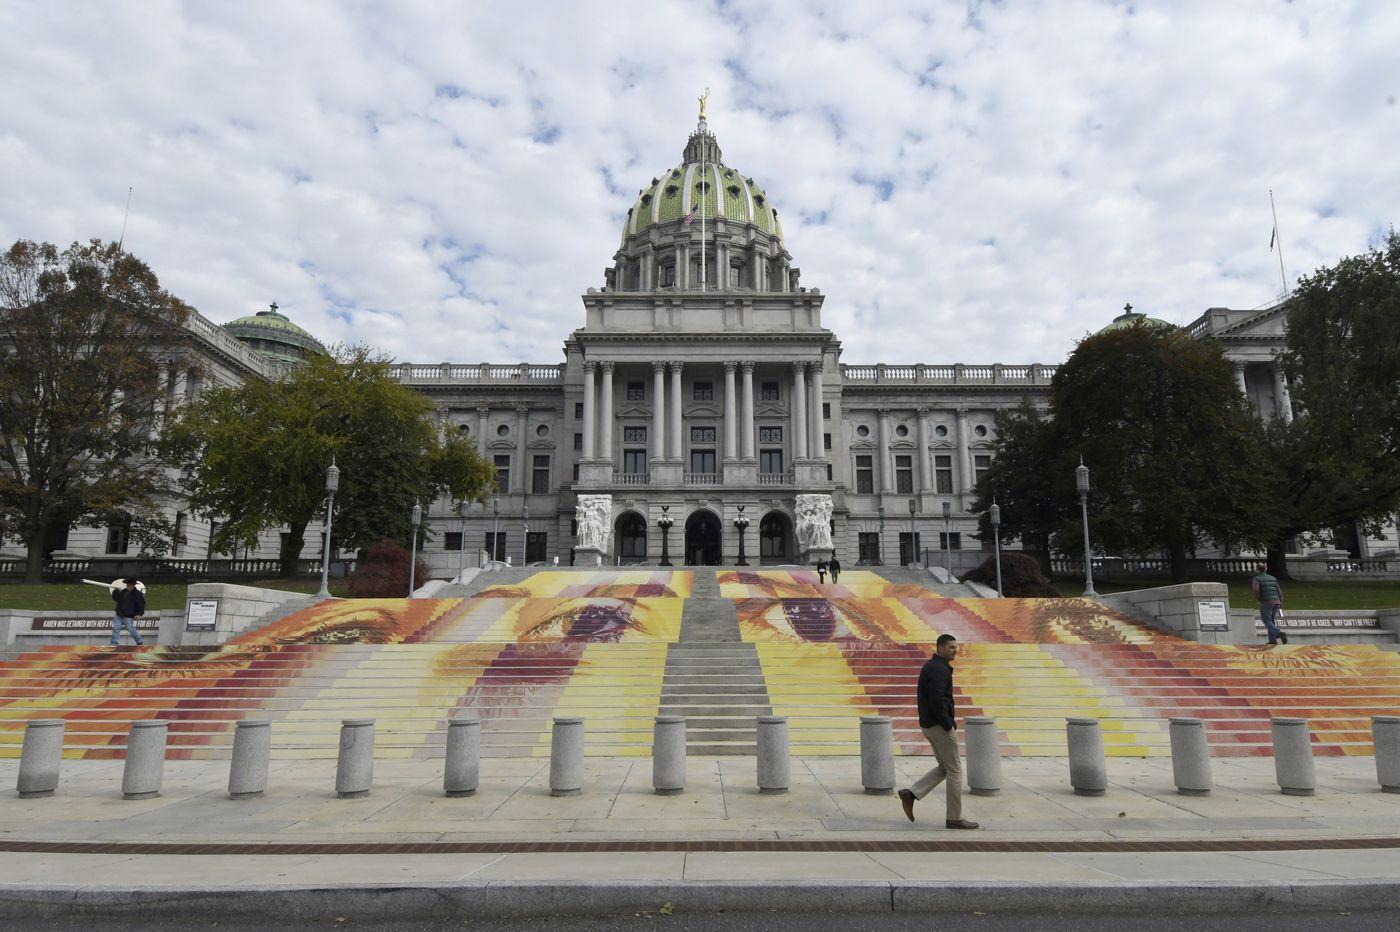 Pa. House and Senate remain in Republican control despite Democratic gains